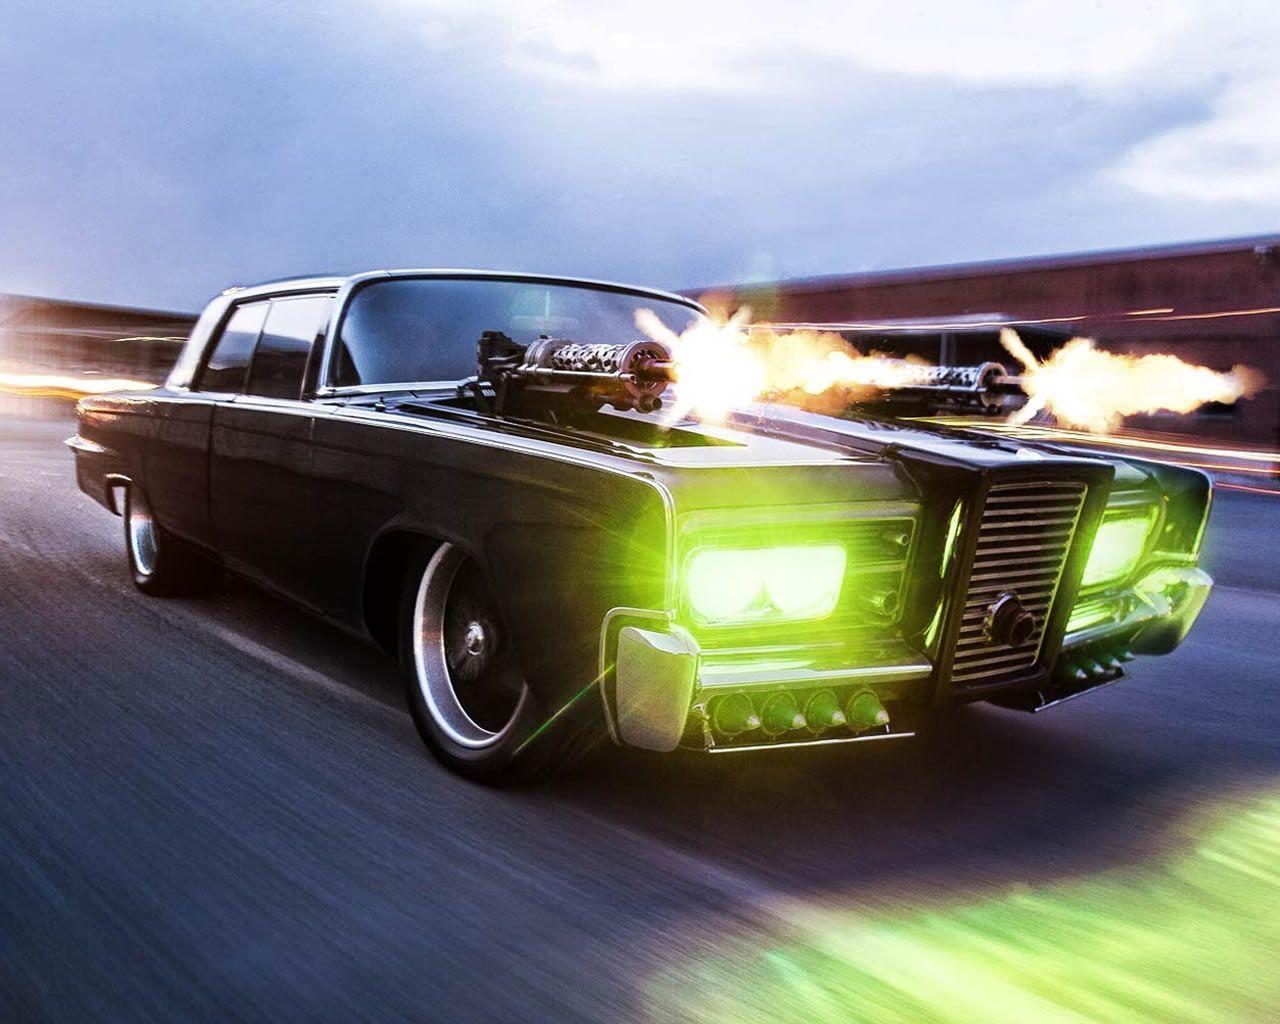 Chrysler Imperial Crown The Black Beauty The Green Hornet